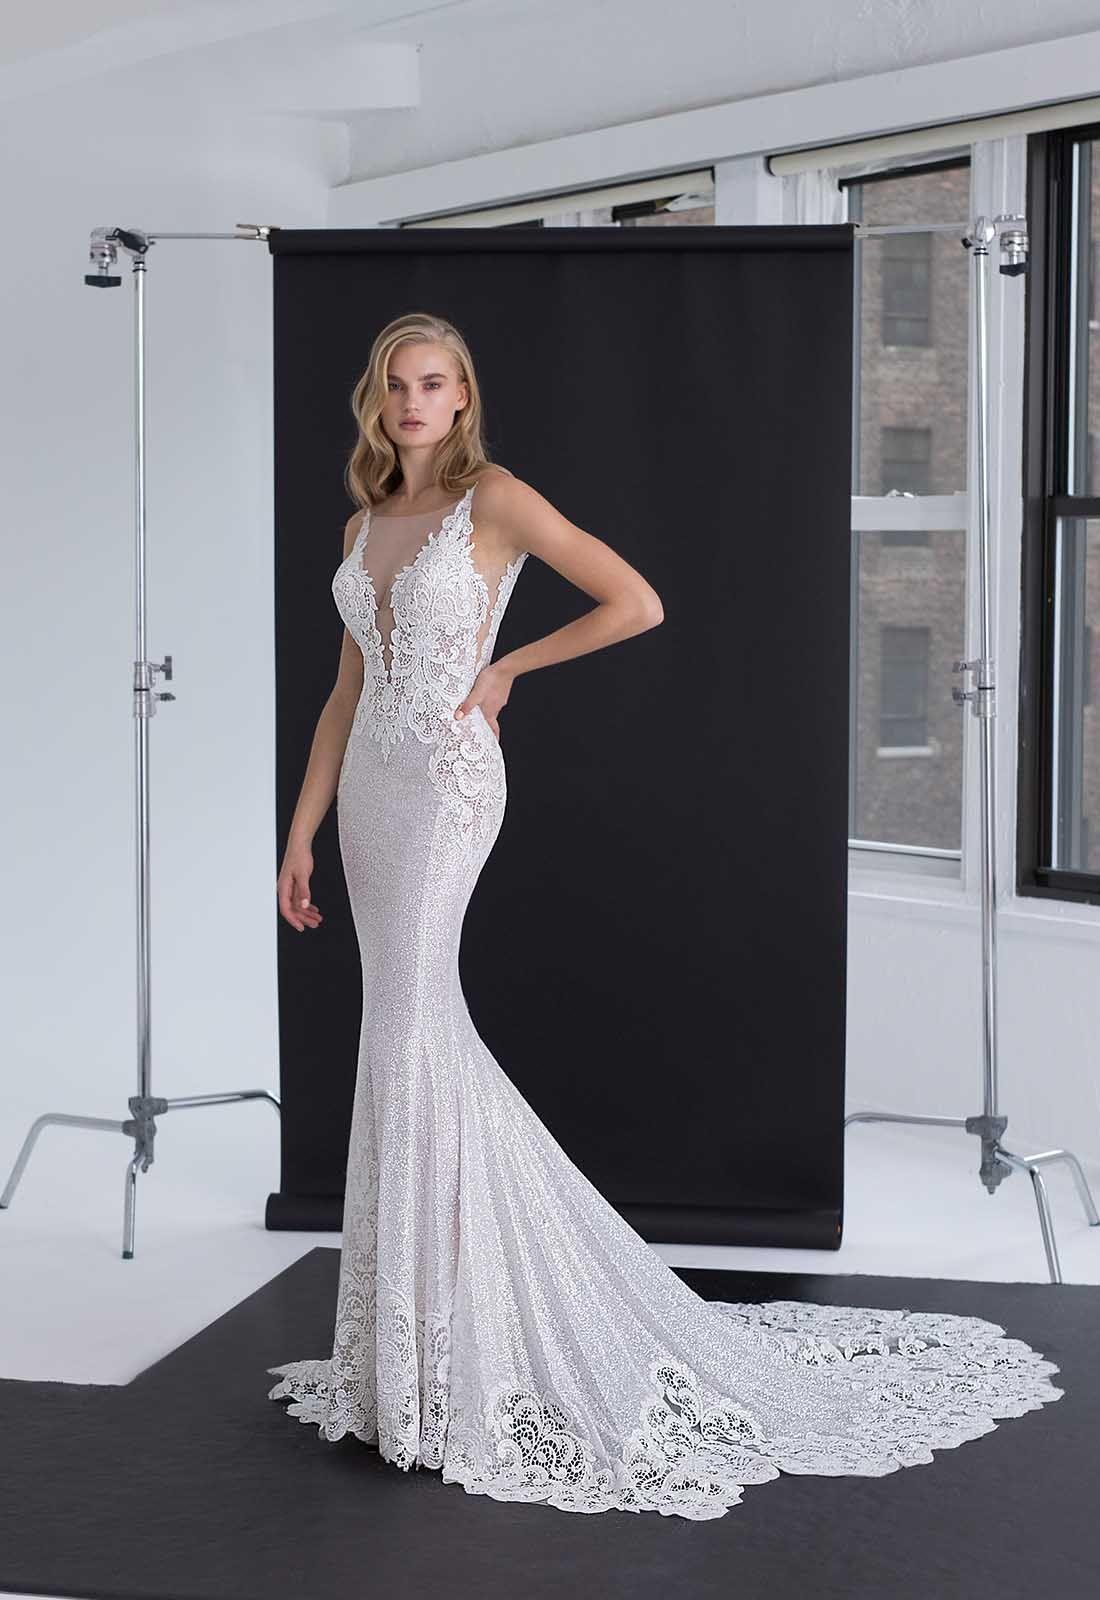 Wedding Dresses / Pnina Tornai 4729 WeddingWire.co.uk